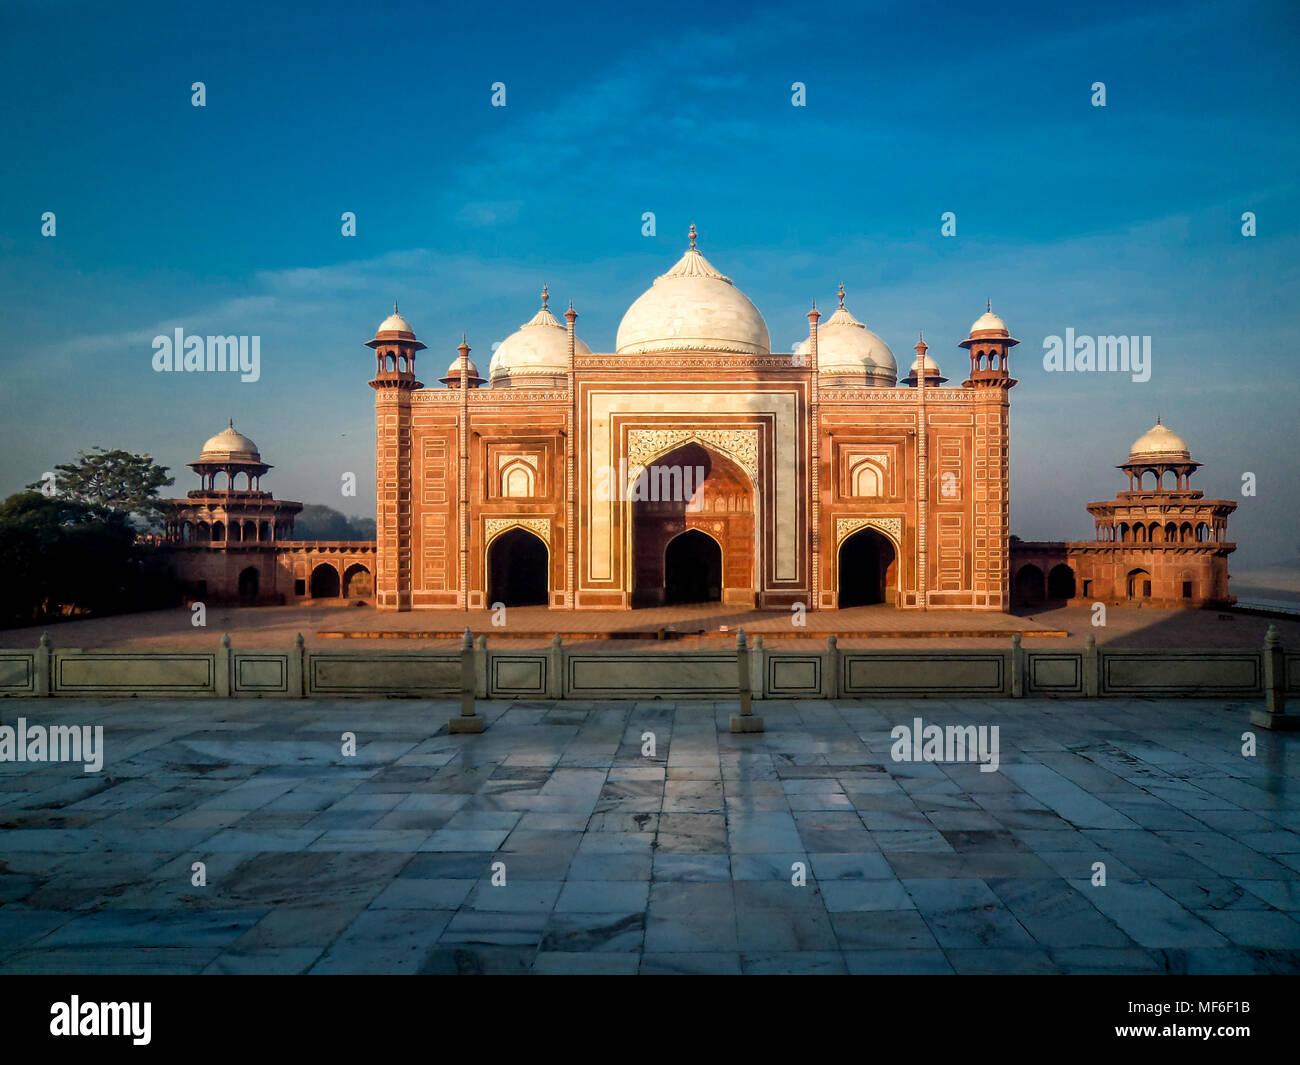 La moschea al Taj Mahal, Agra, India Immagini Stock